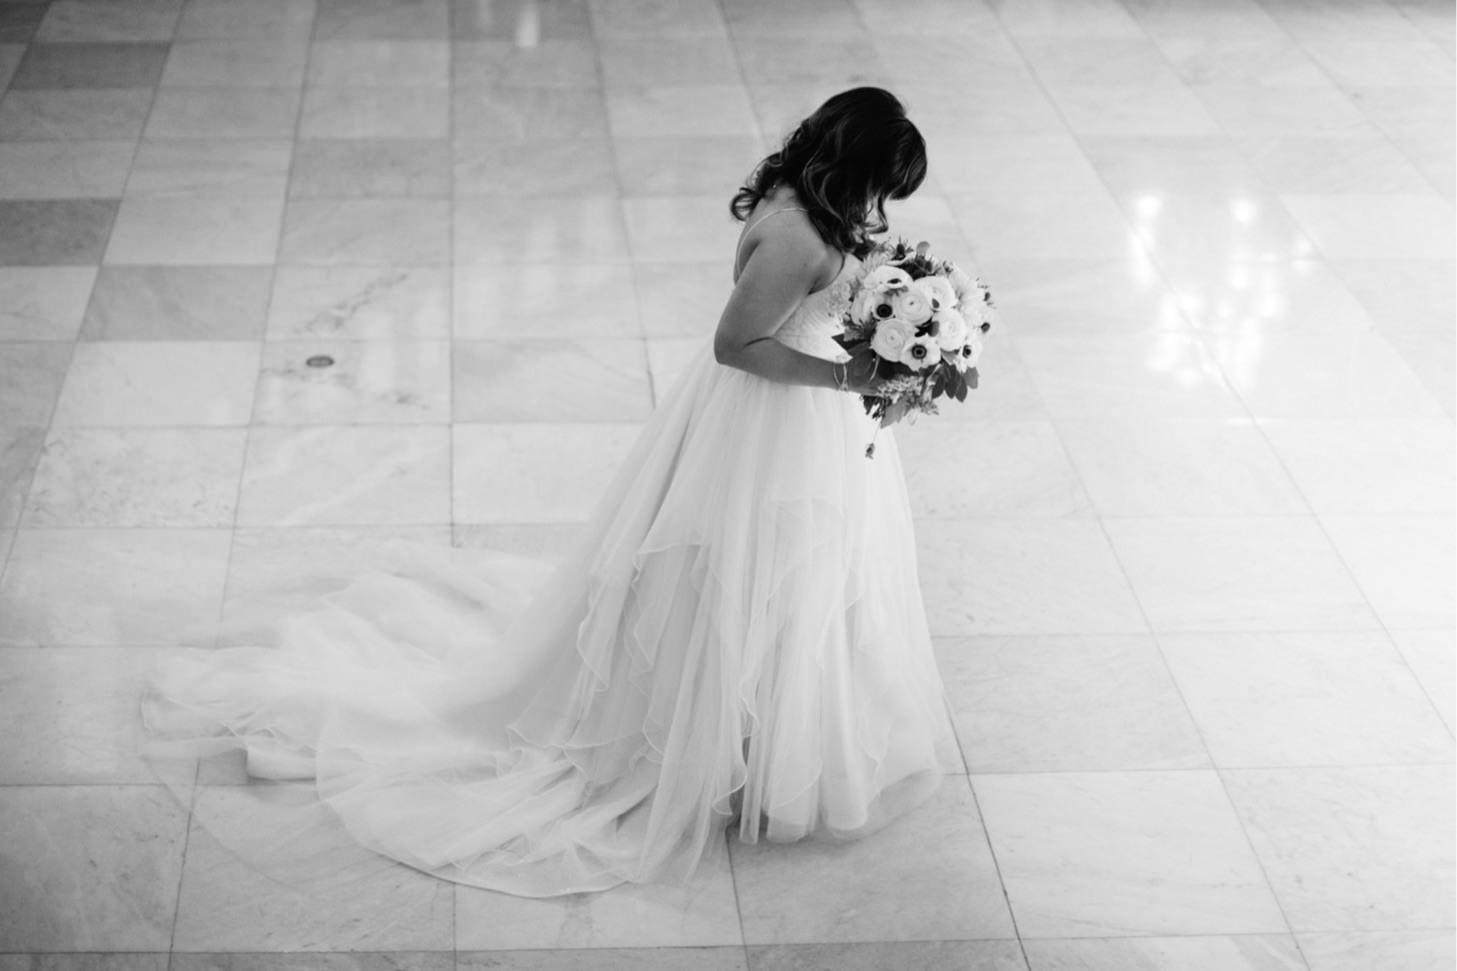 indiana-state-house-wedding-downtown-indianapolis-wedding-photographer010.JPG